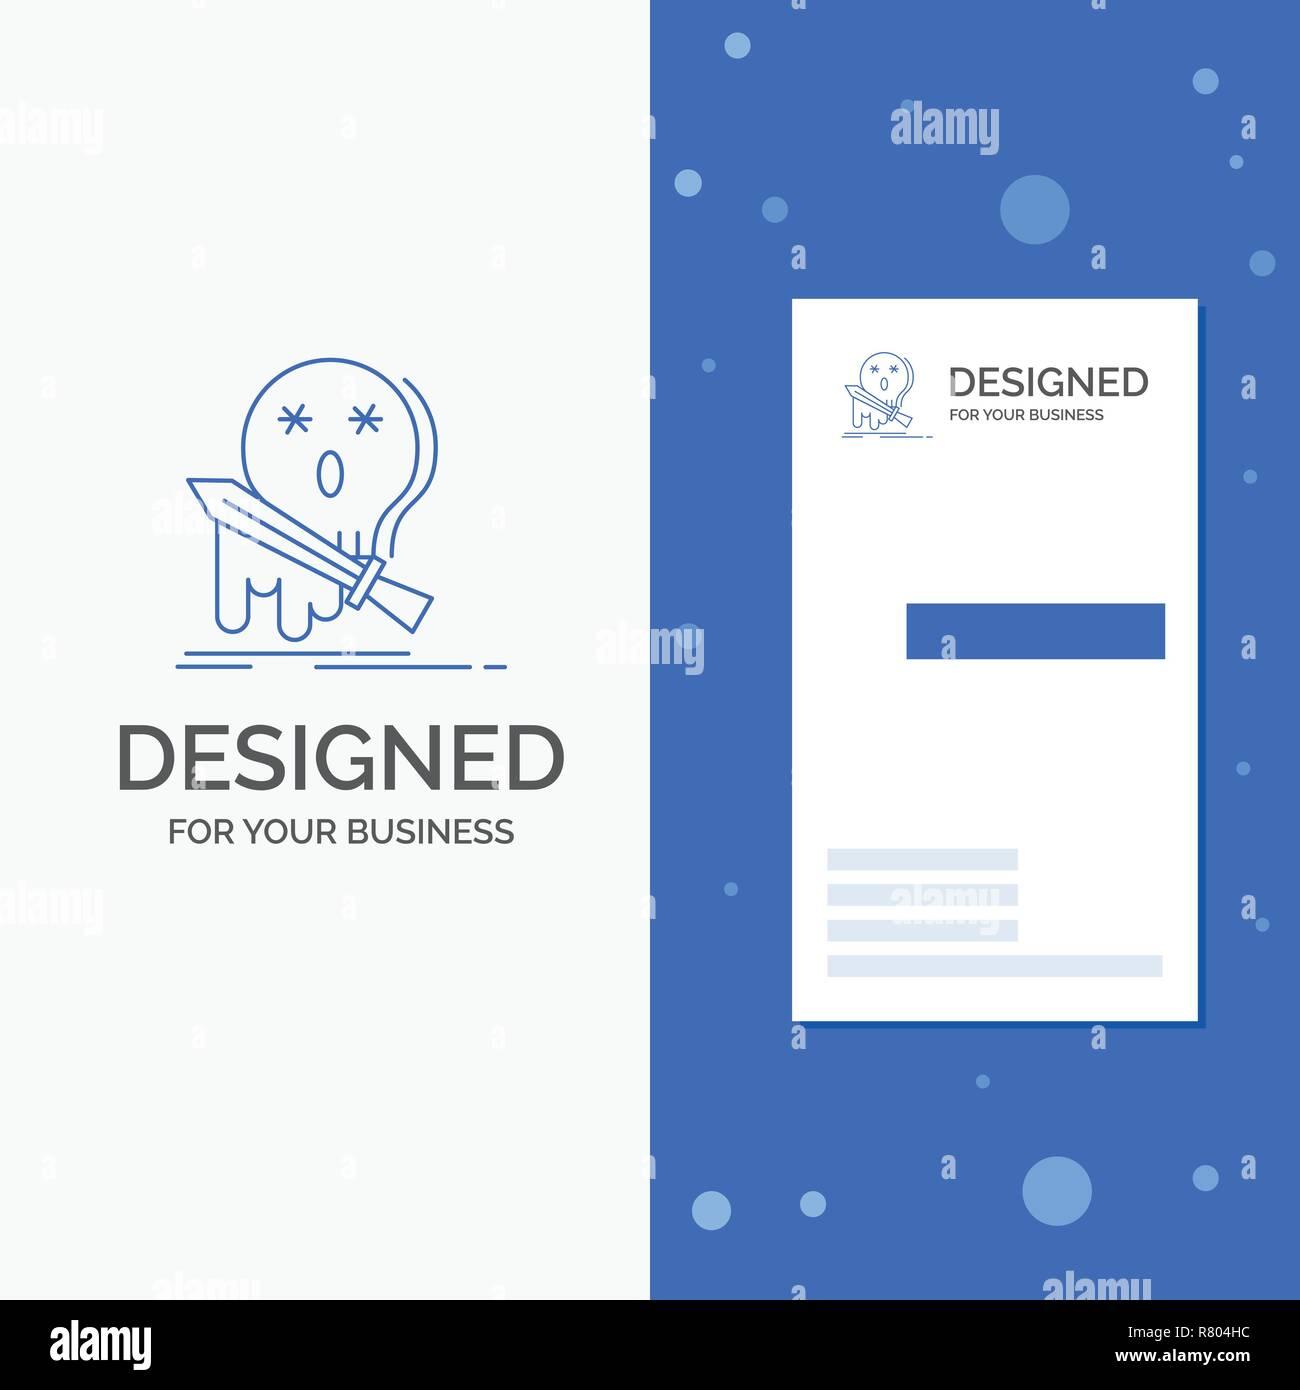 Logo Dentreprise En Cas De Deces Frag Jeu Tuer Epee Bleu Vertical Affaires Modele Carte Visite